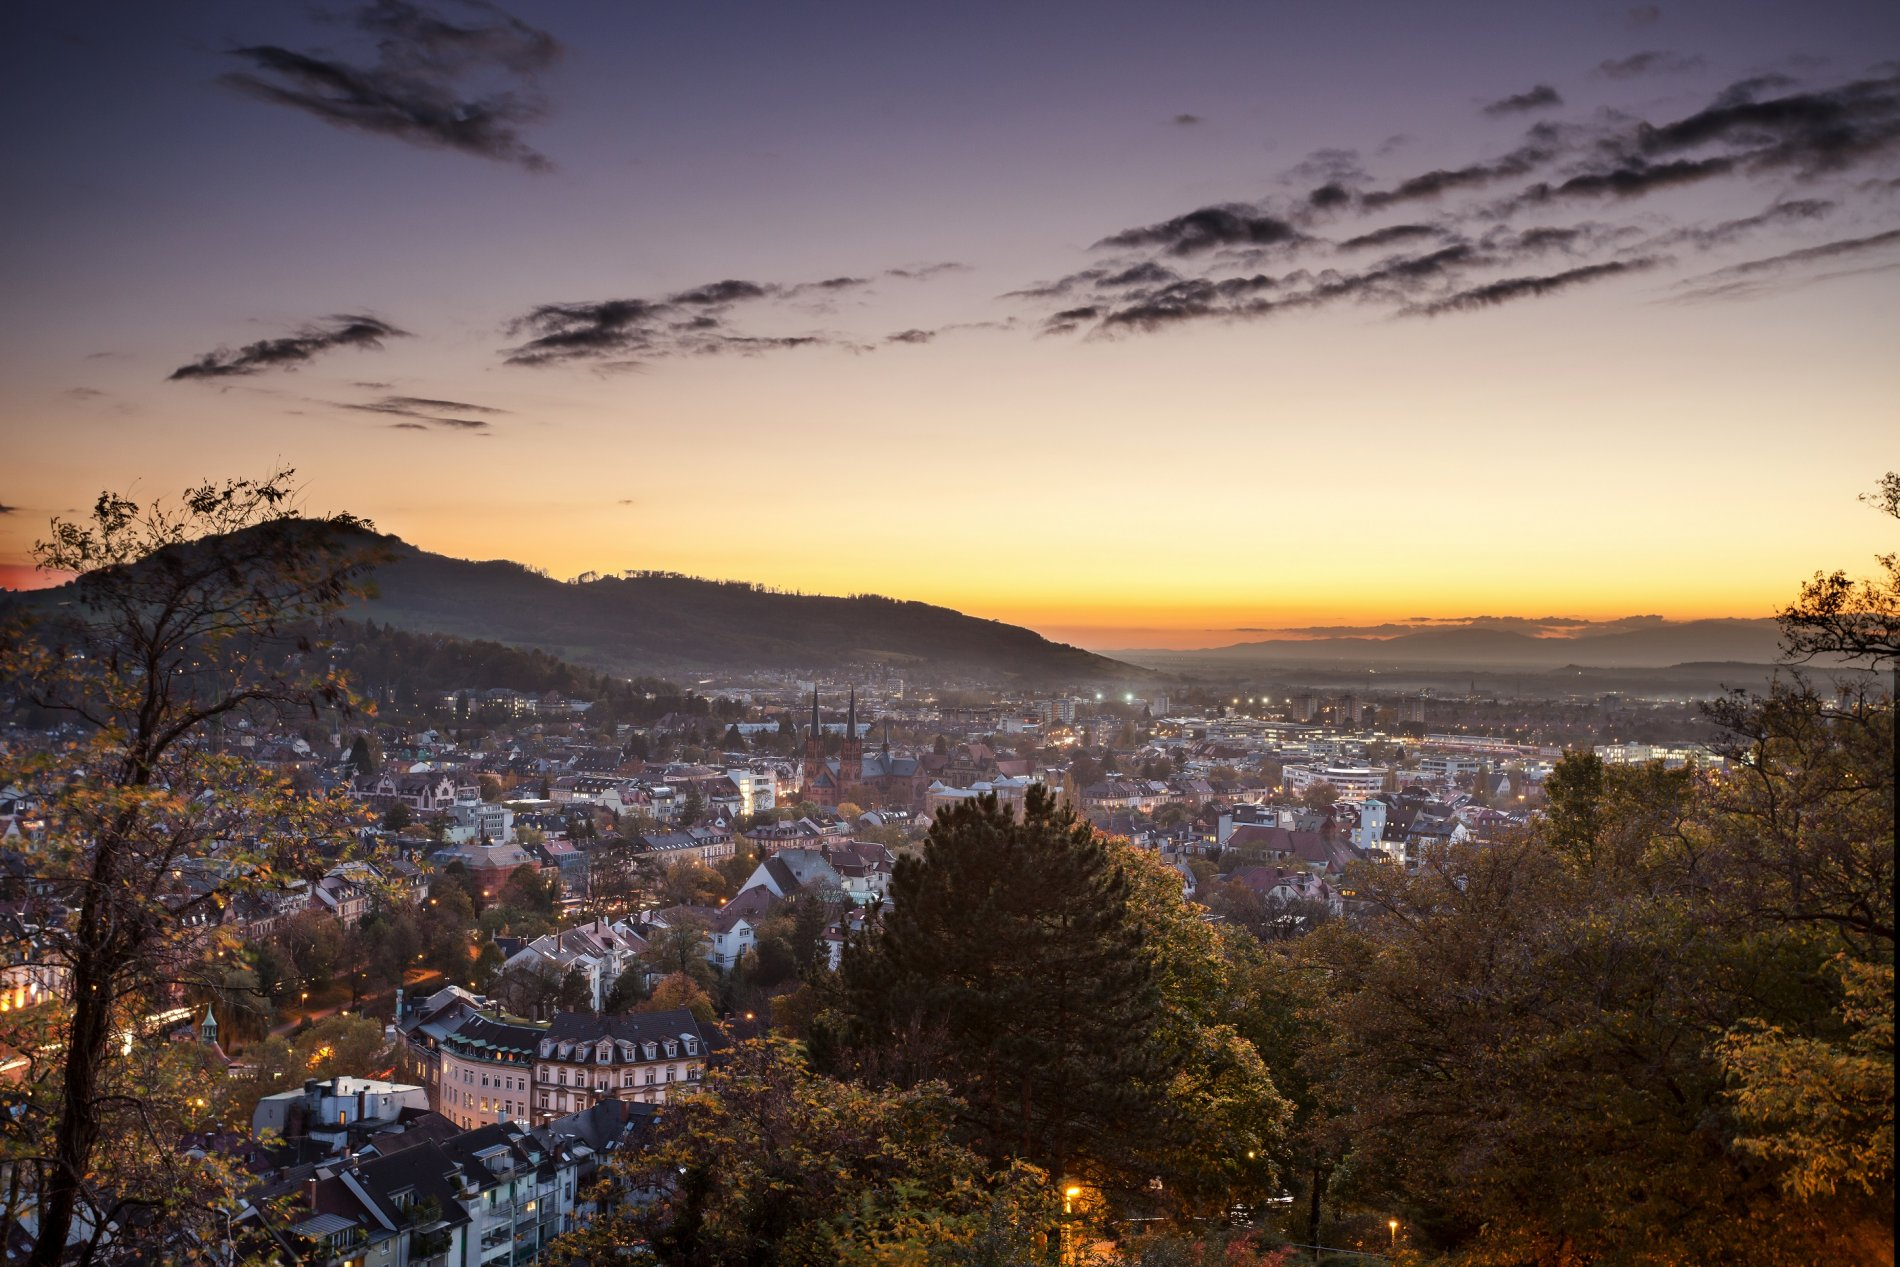 Freiburg Blick vom Schlossberg